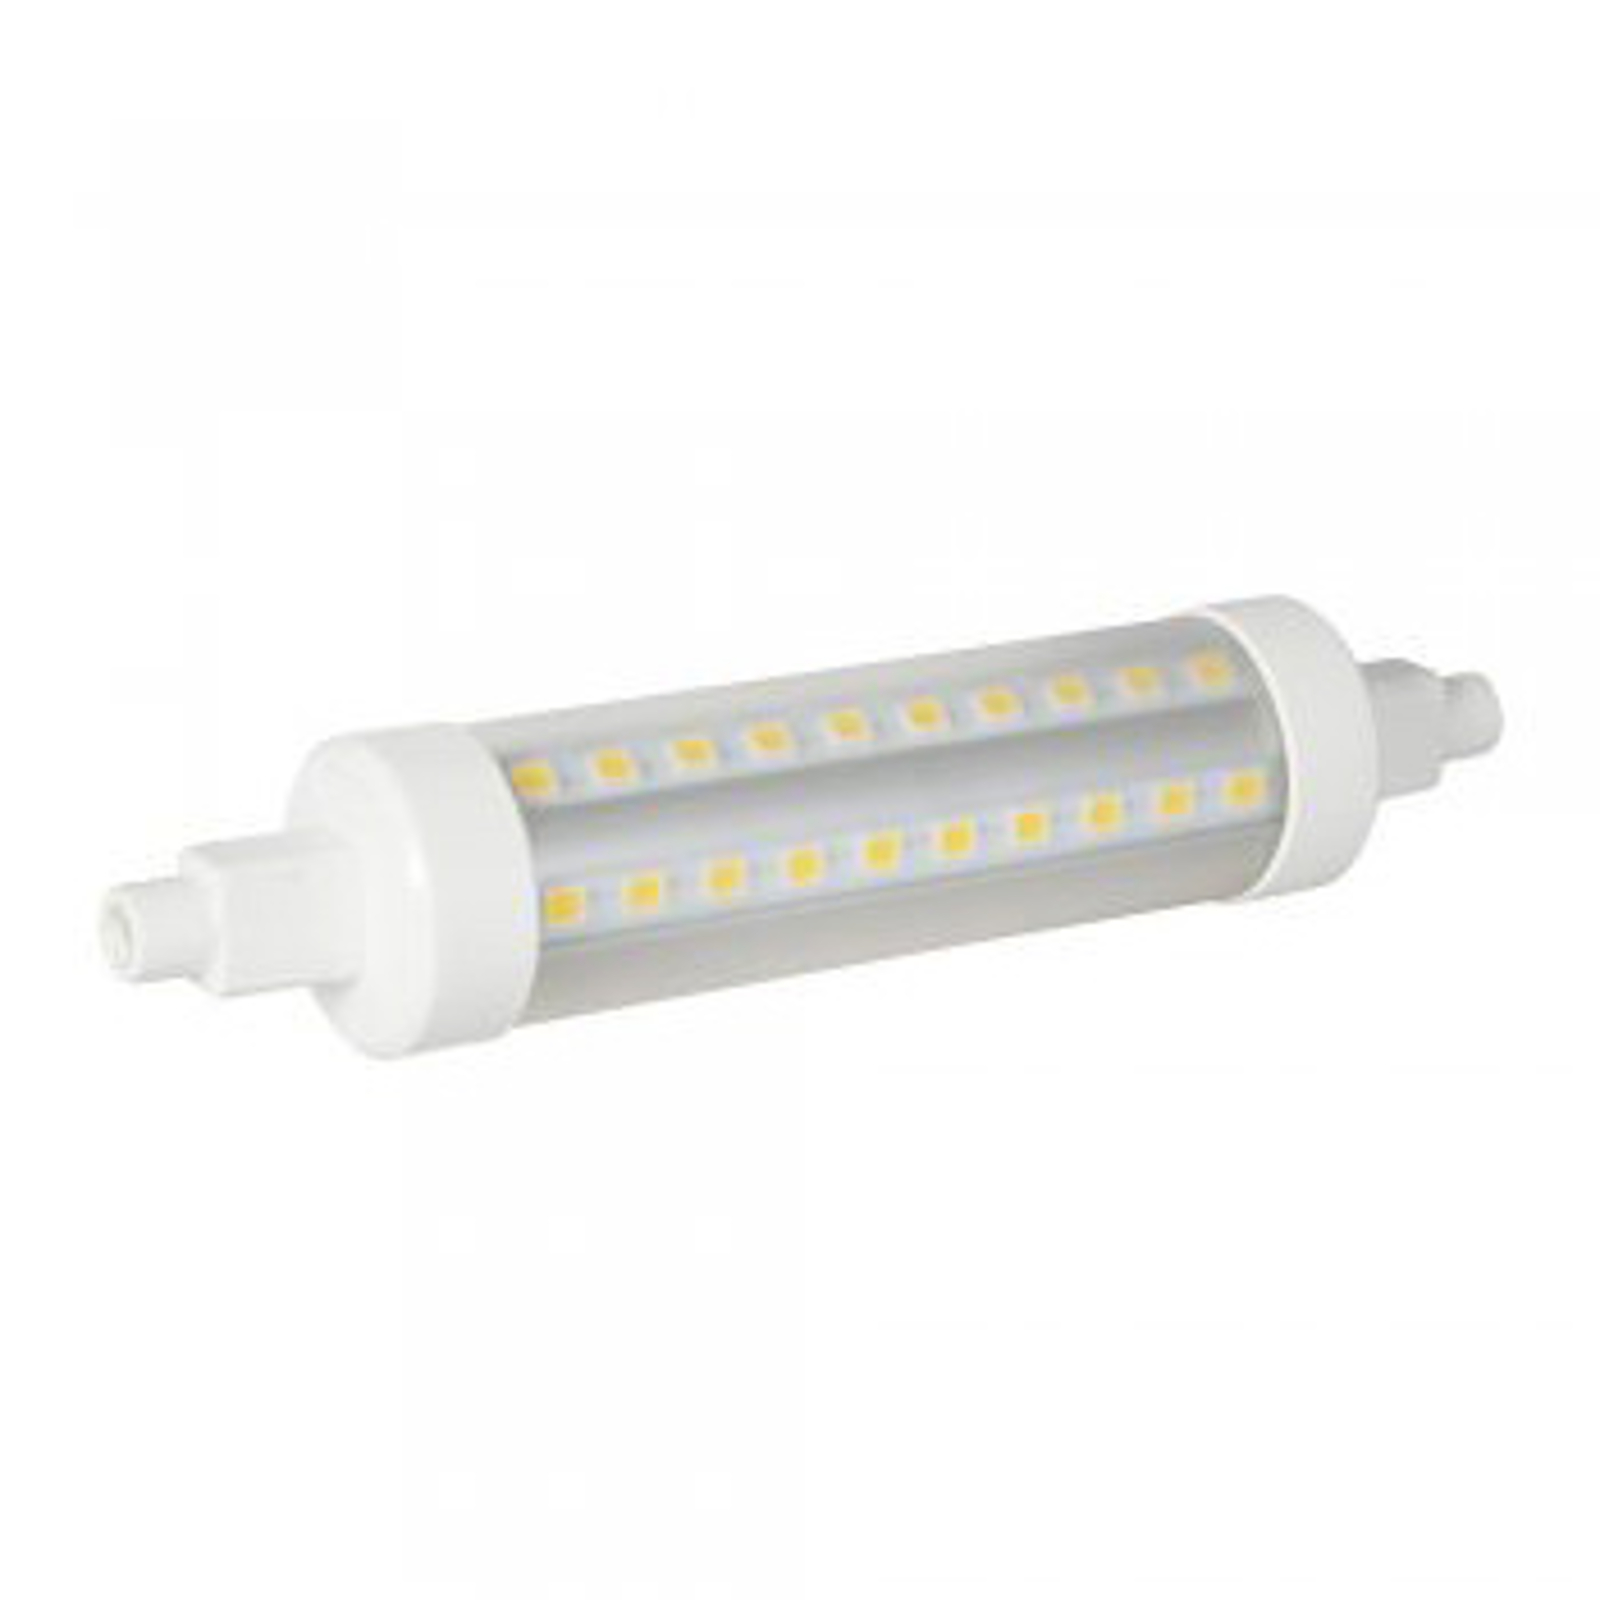 R7s 8W 827 LED-Leuchtmittel VEO in Stabform